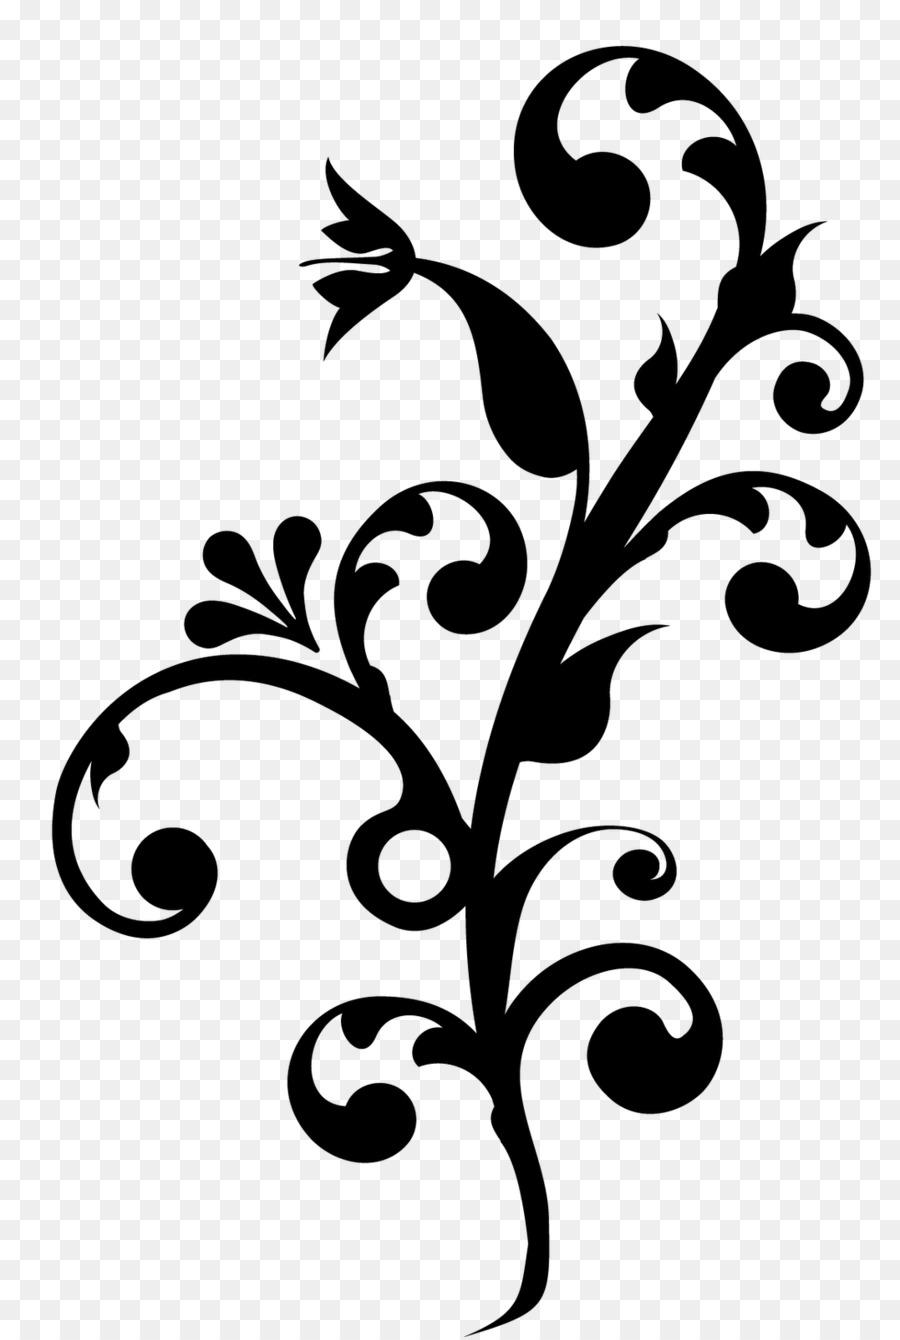 Batik pattern clipart image free stock Black And White Flower clipart - Batik, Flower, Design, transparent ... image free stock